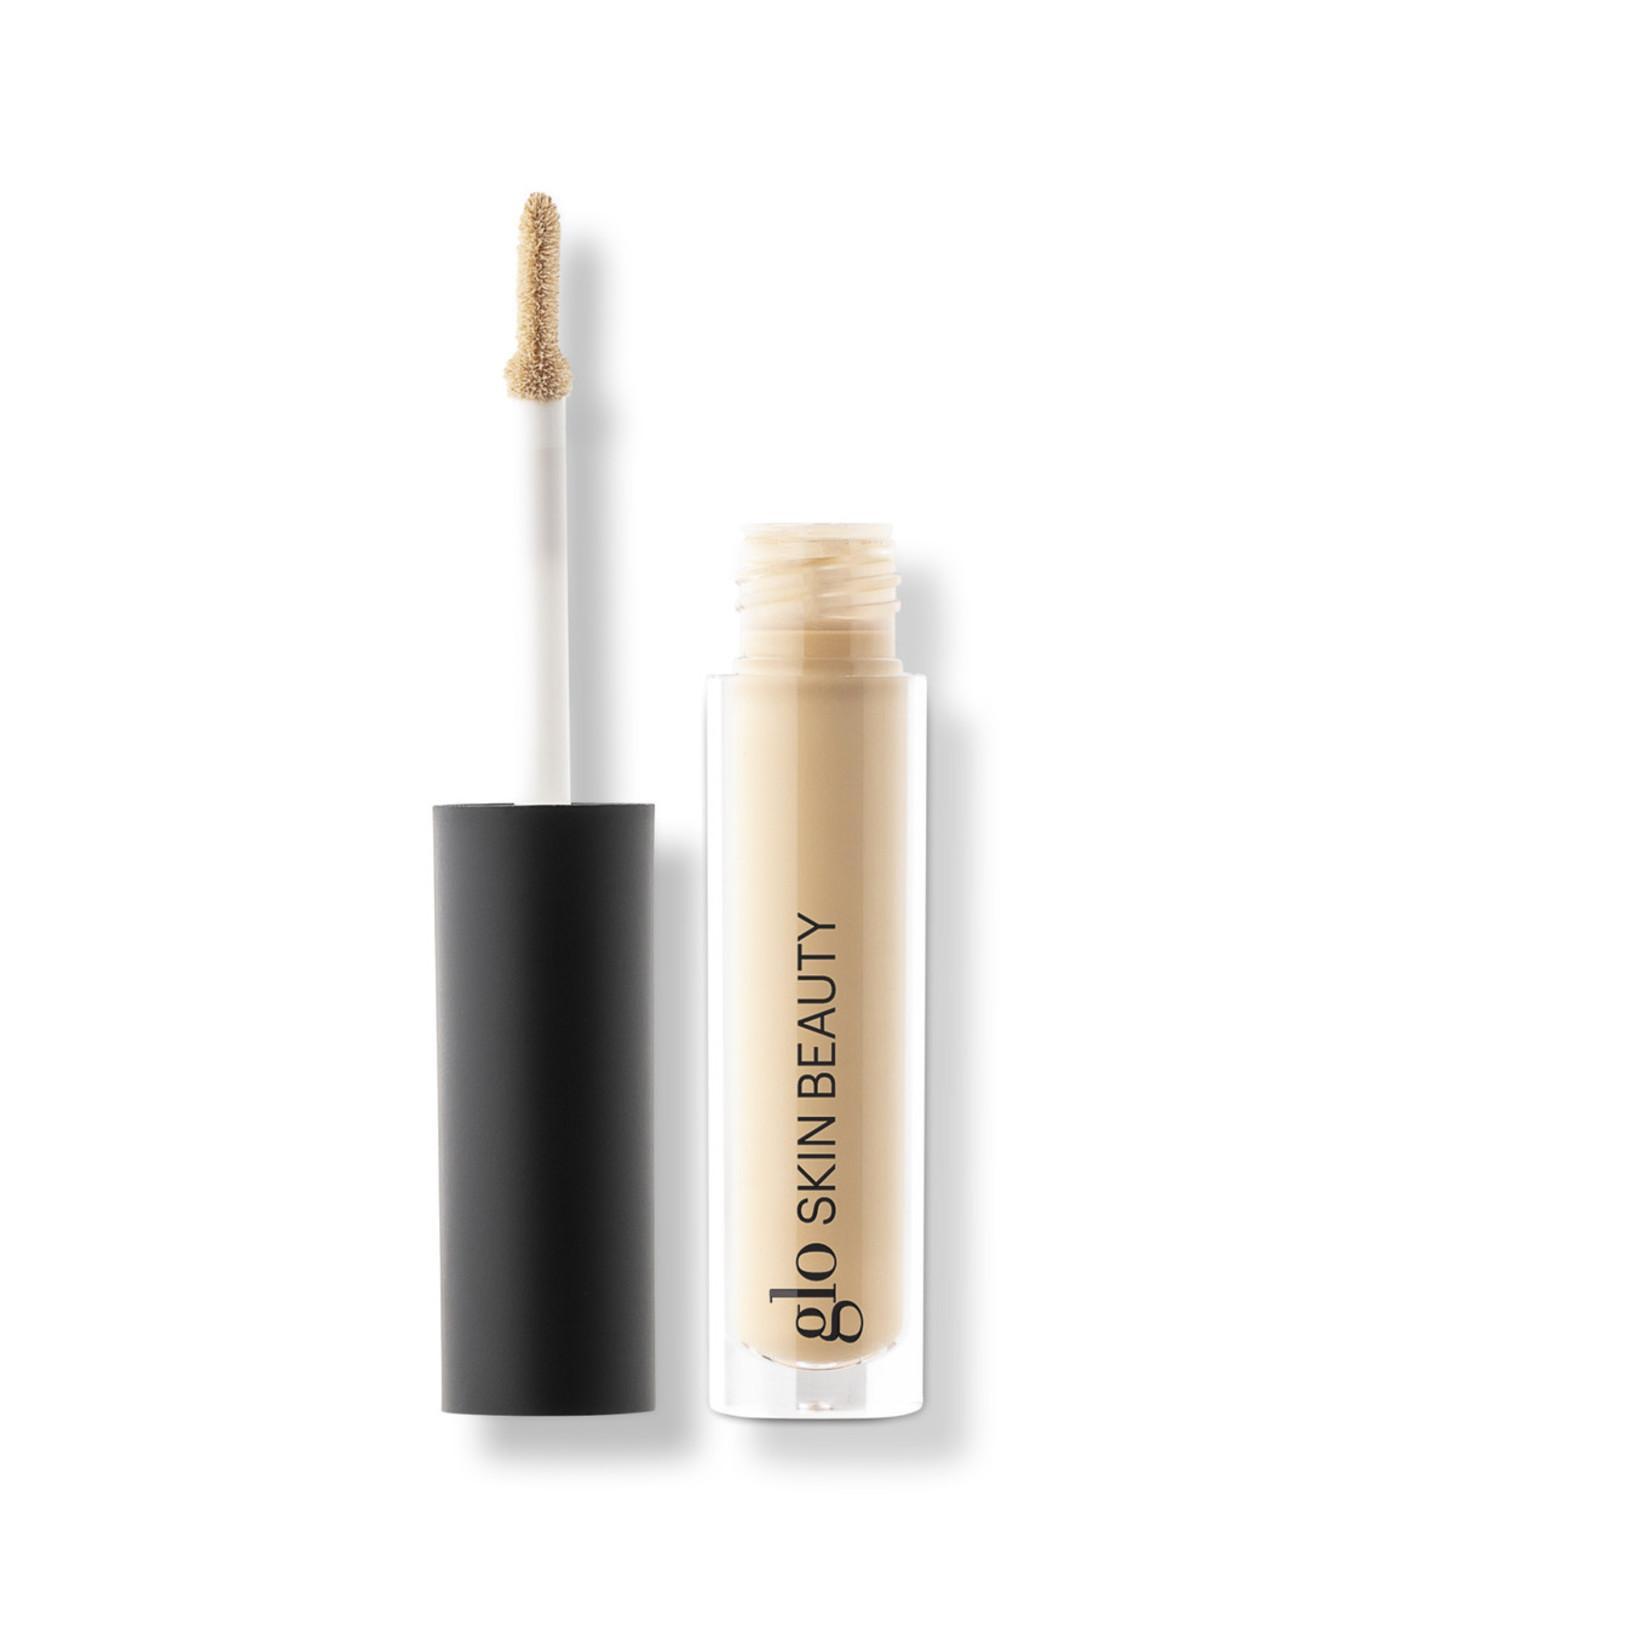 Glo Skin Beauty Liquid Bright Concealer